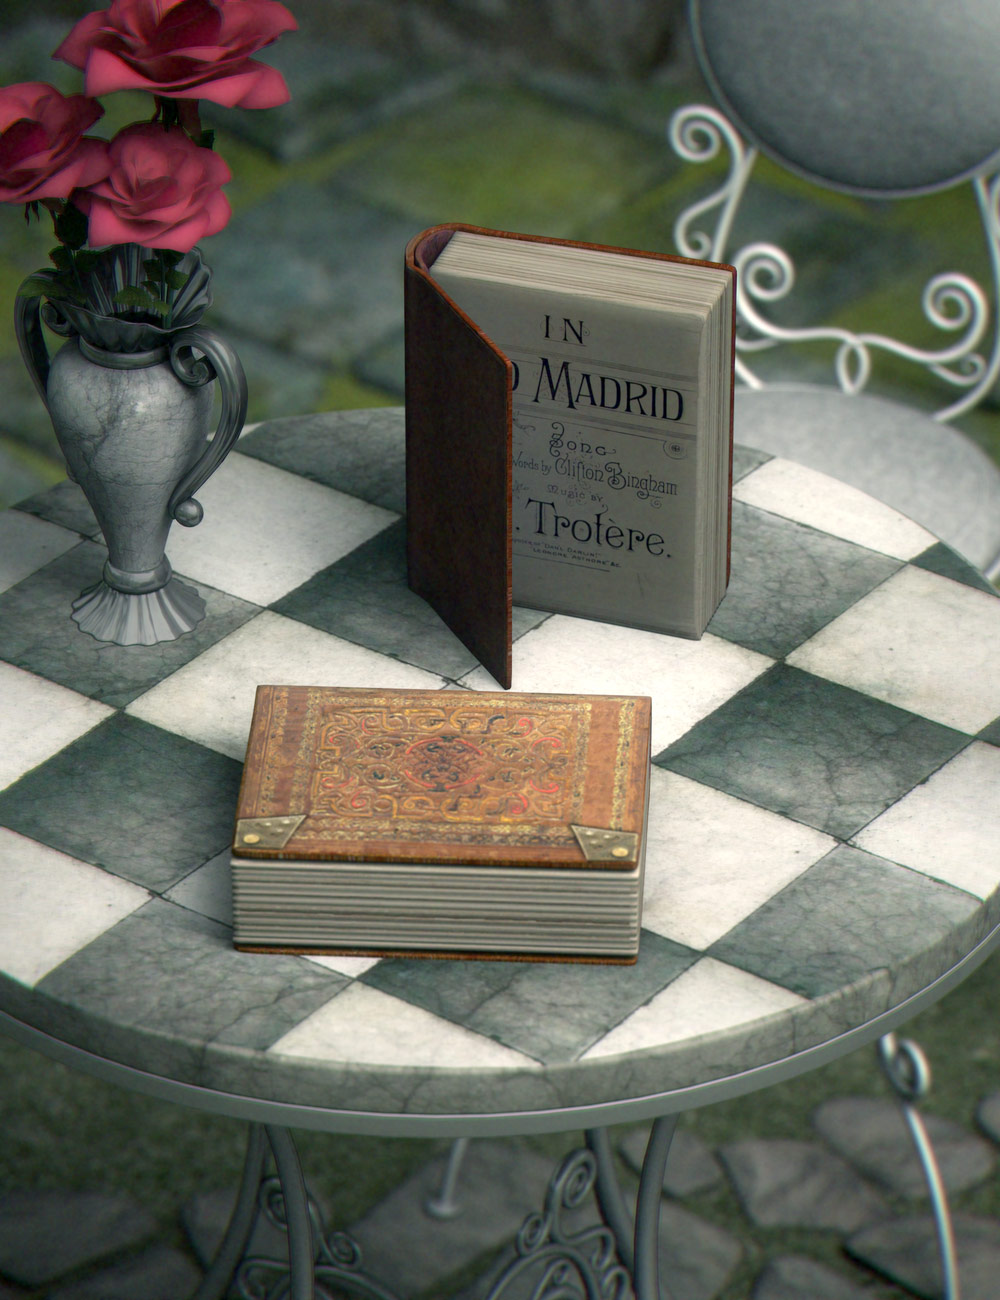 HLA Book by: PoisenedLily, 3D Models by Daz 3D